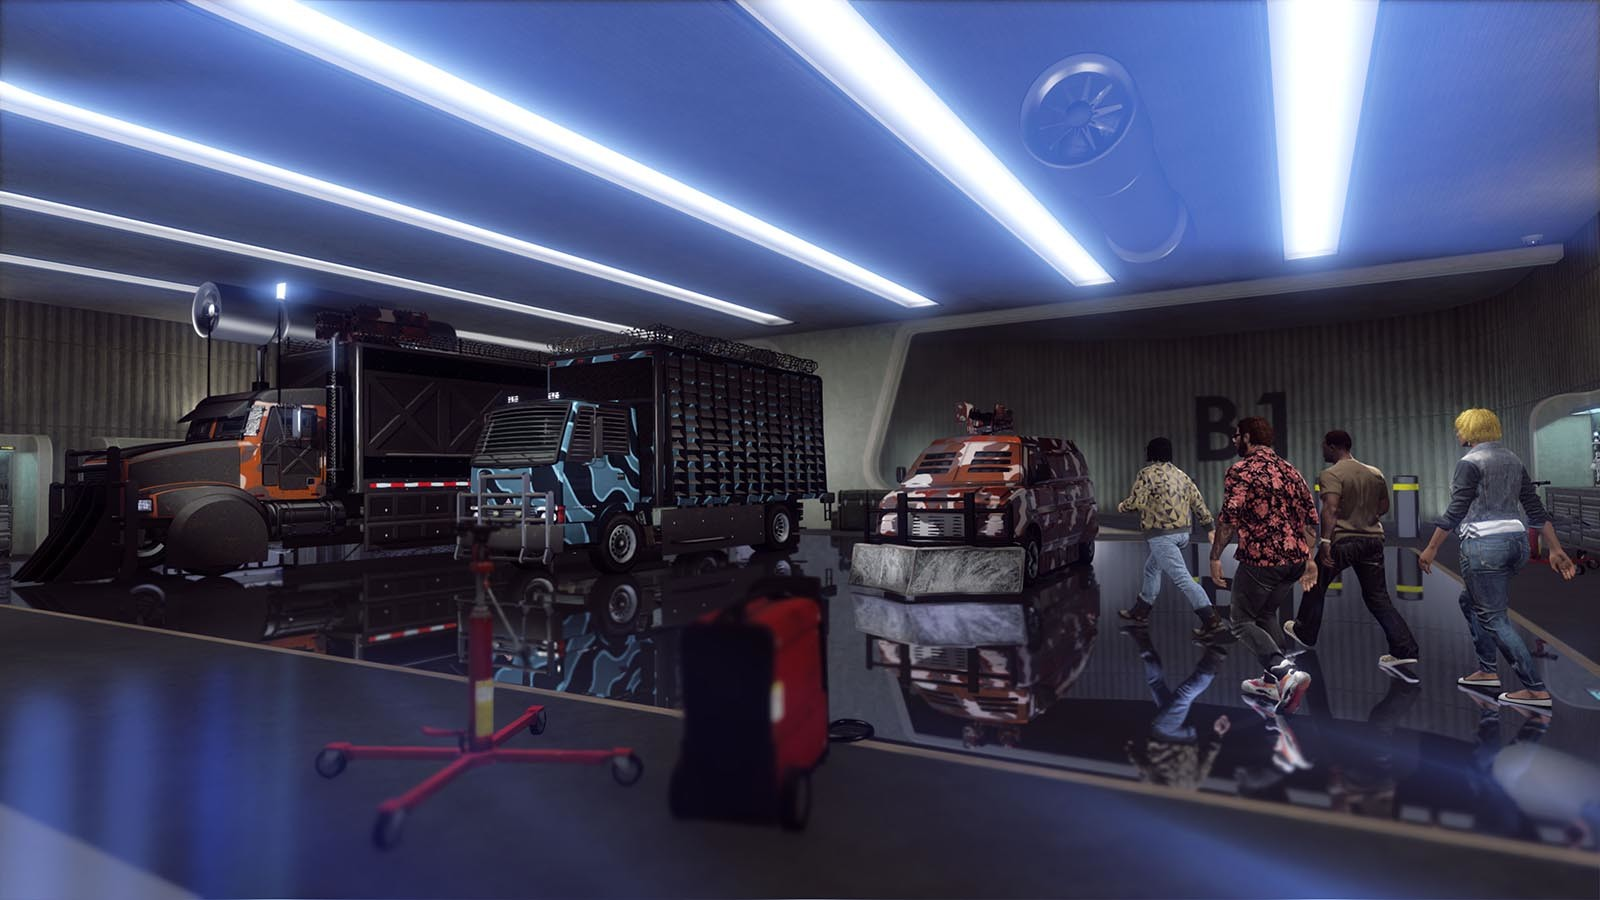 Gta V Criminal Enterprise Starter Pack Rockstar Social Club Cd Key Jetz Iron Gym Fr Pc Online Kaufen